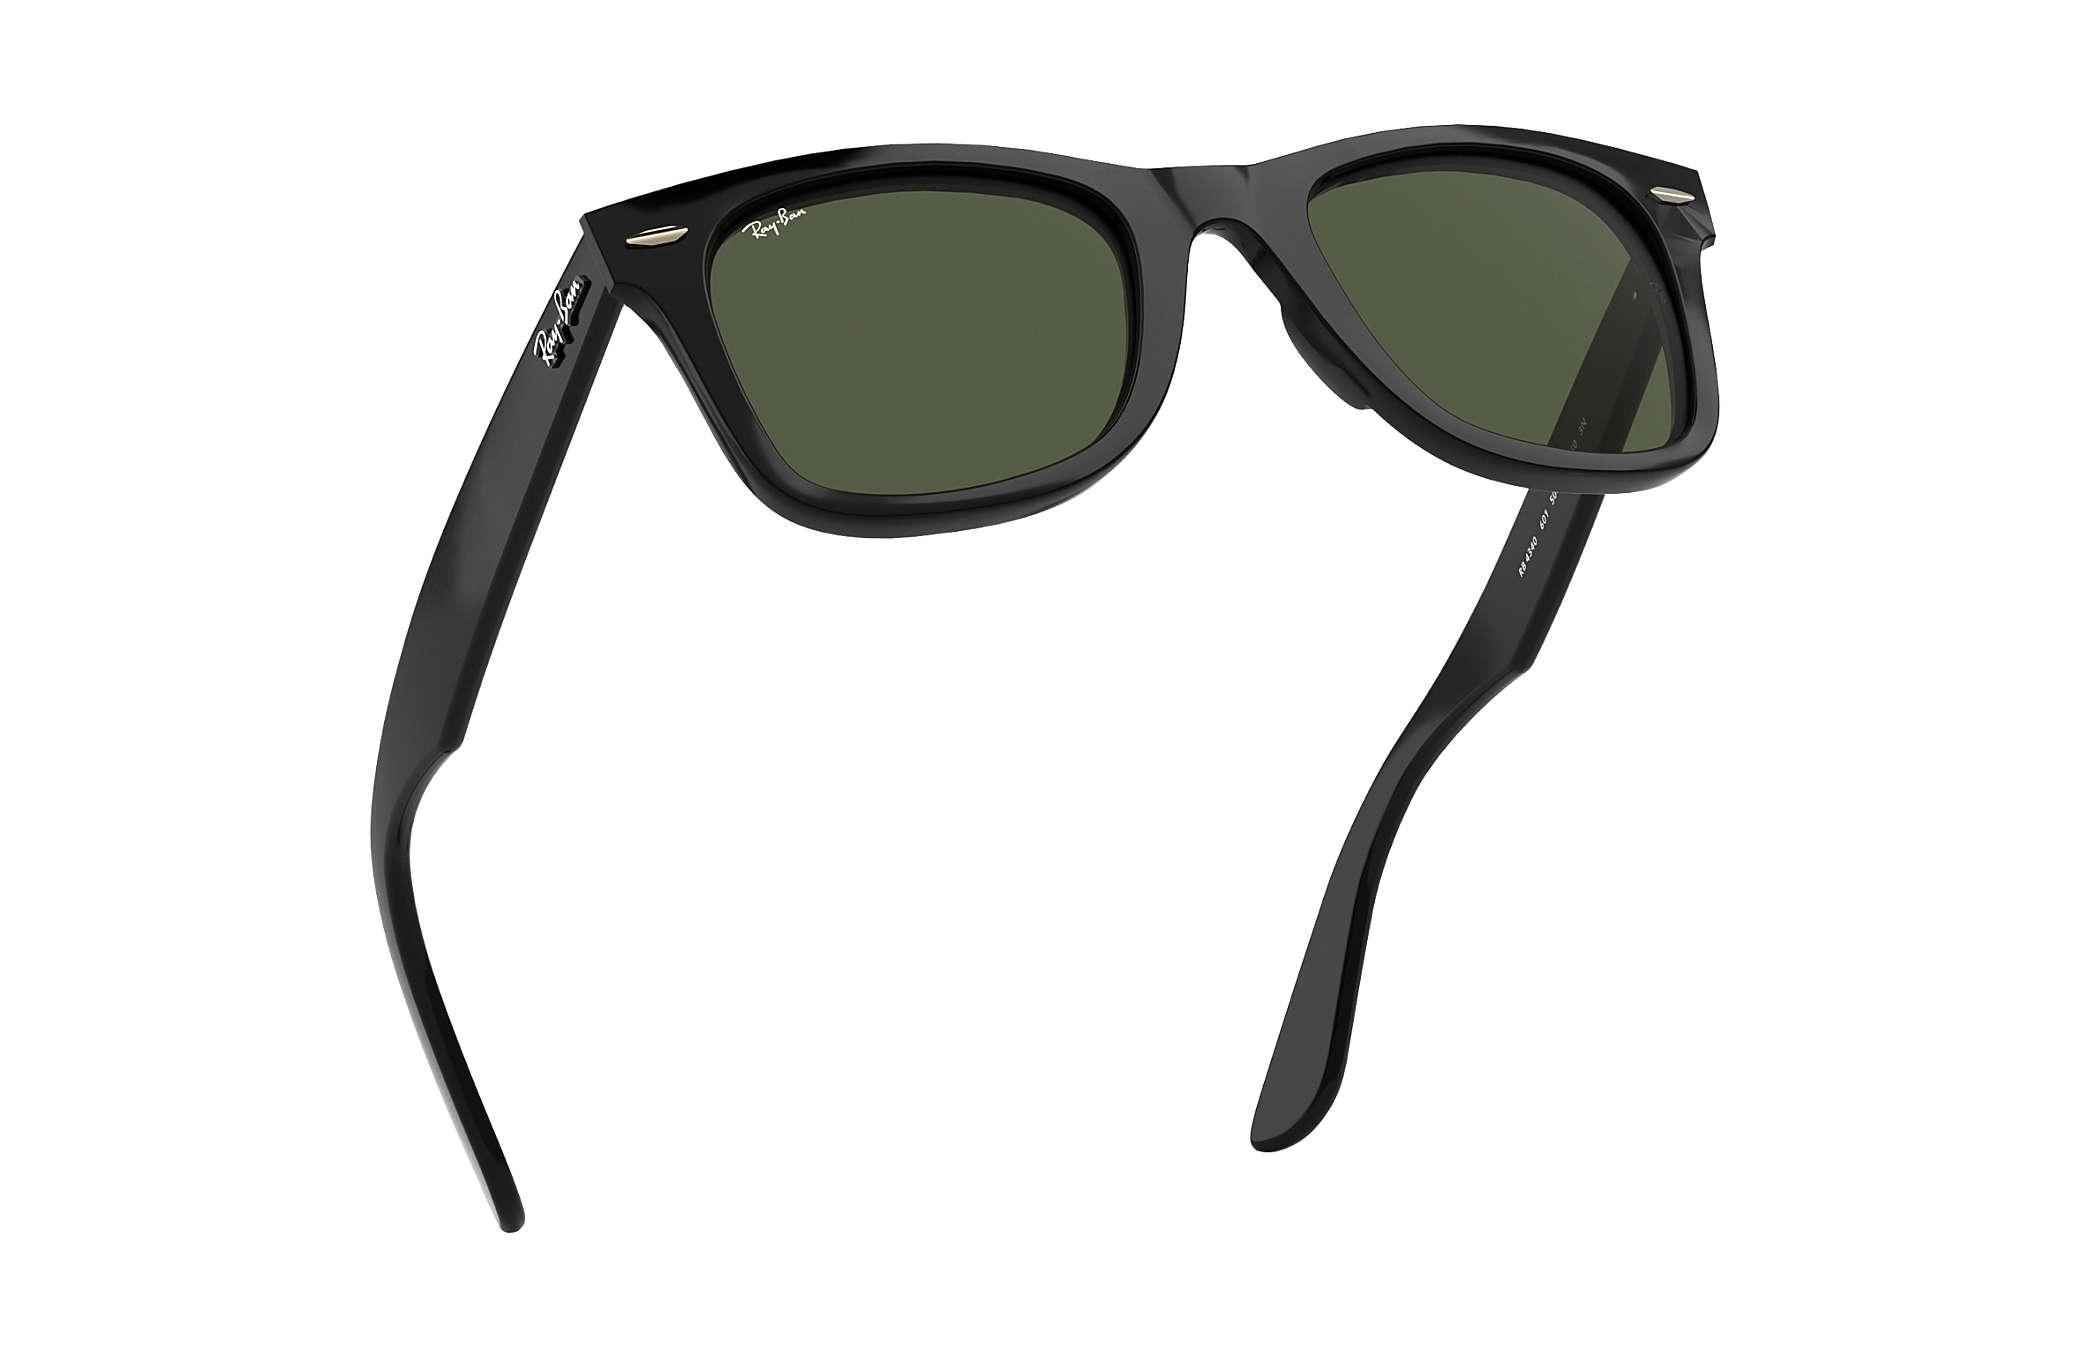 c3b027c0b40061 Ray-Ban Wayfarer Ease RB4340 Black - Injected - Green Lenses ...